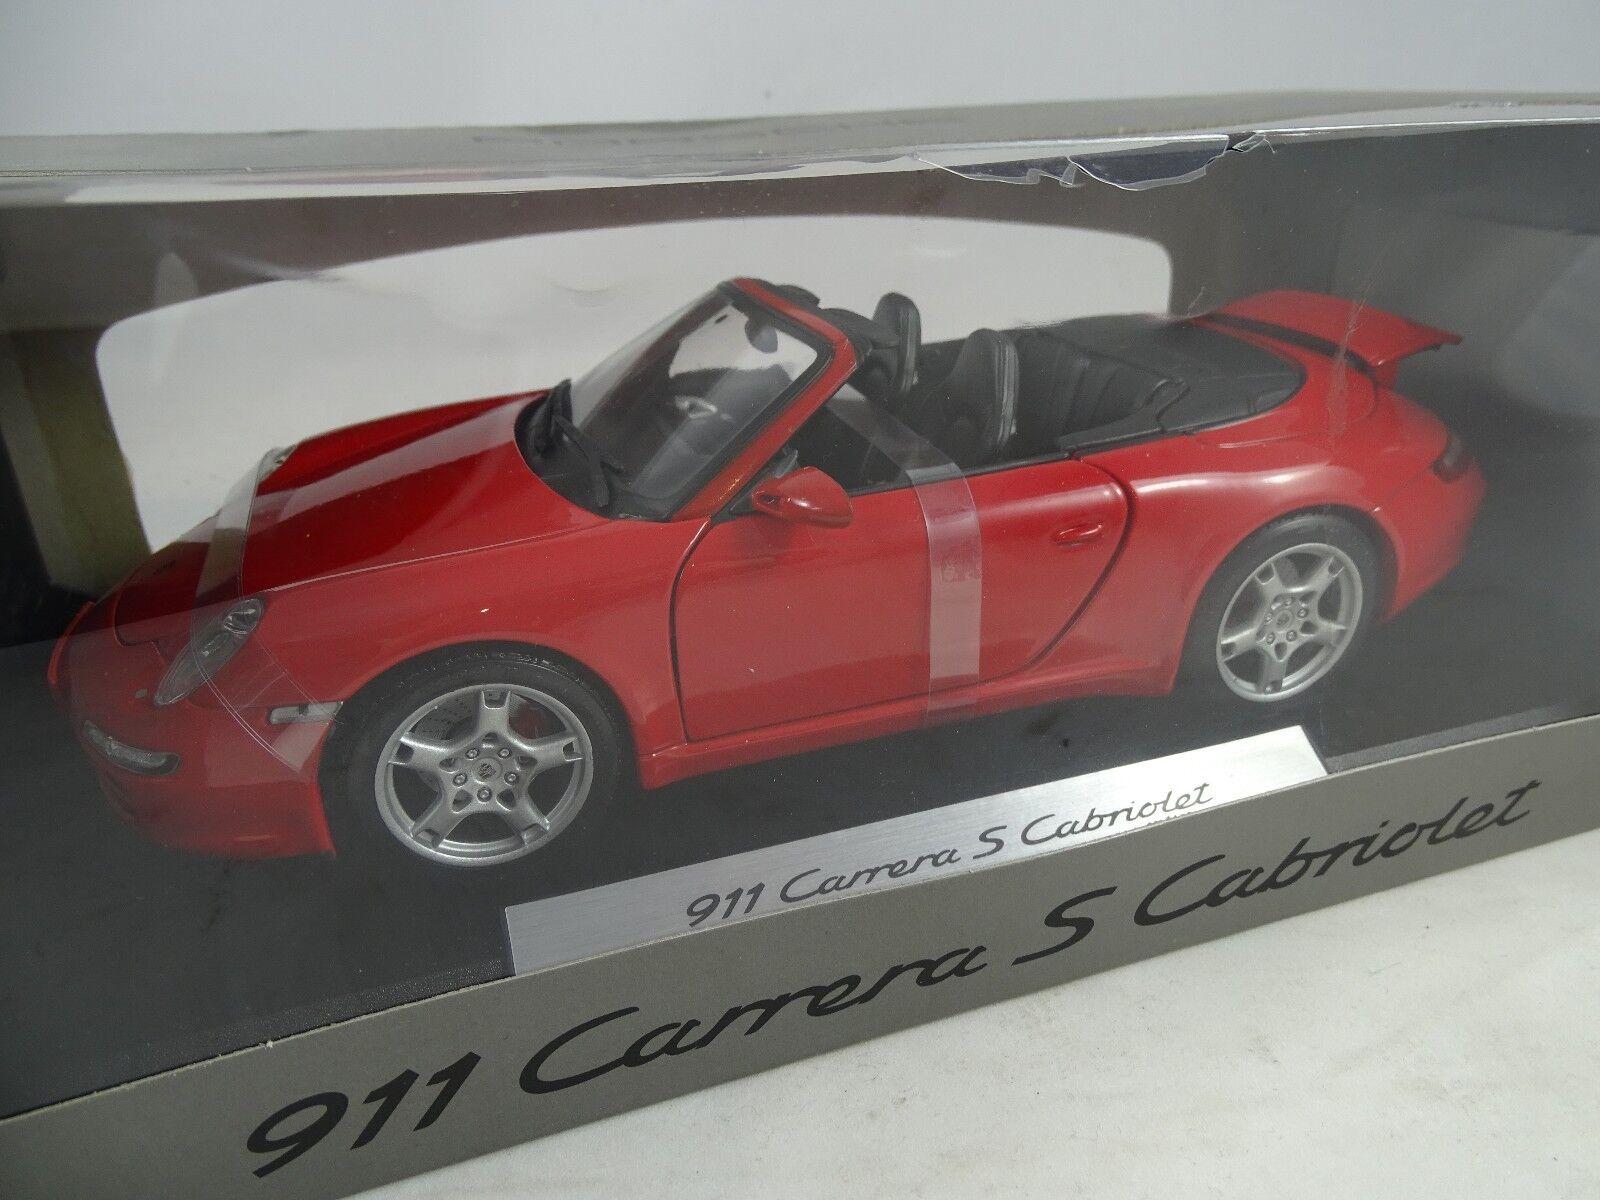 1 18  Dealermodell Porsche 911 Carrera S Cabriolet red  RARITÄT §